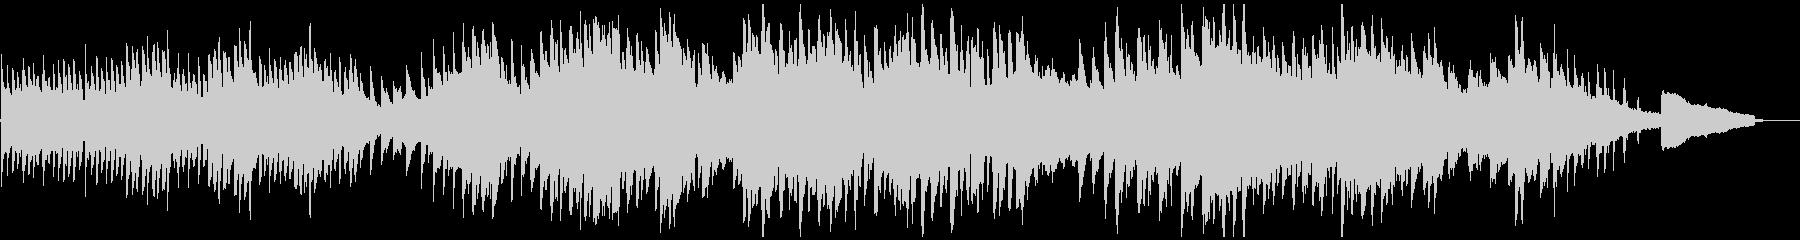 Cinematic Piano 11の未再生の波形